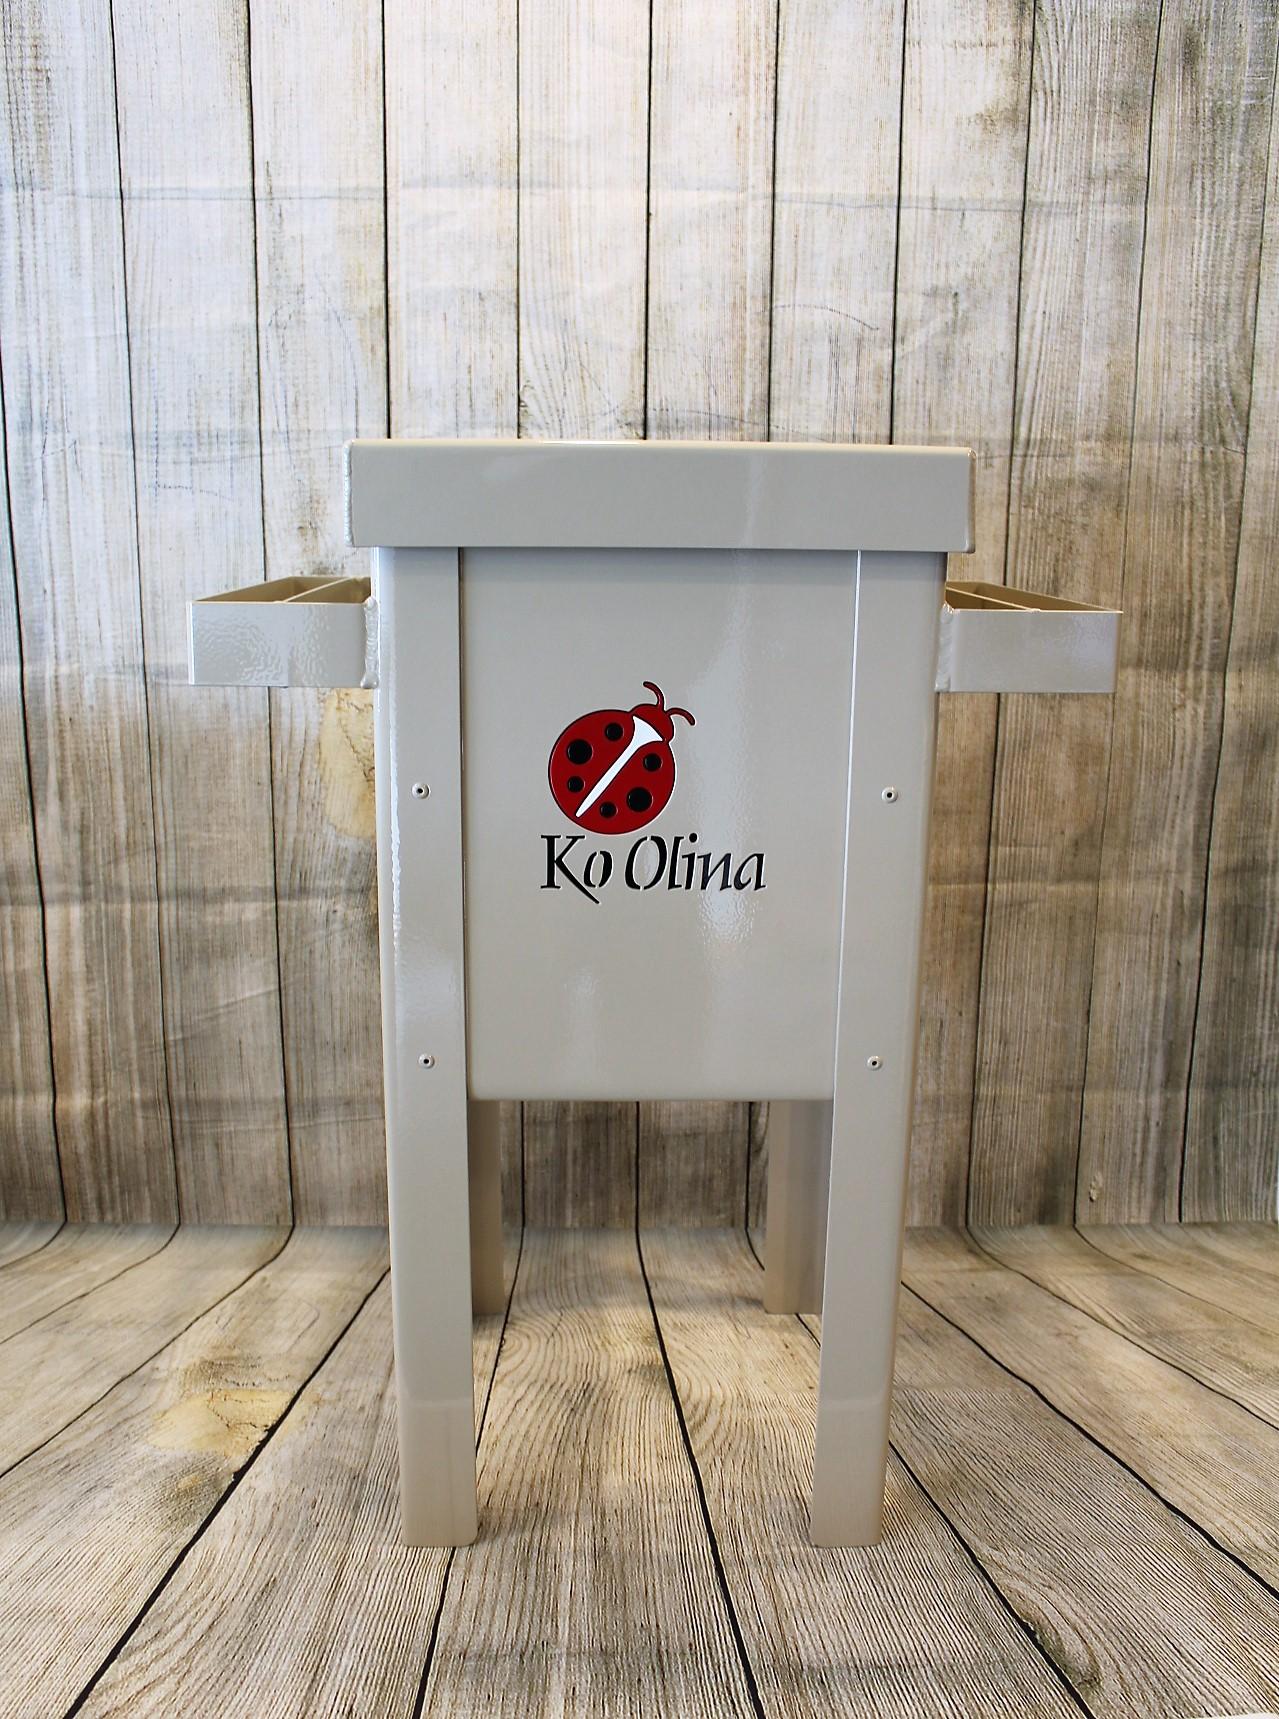 Club Cleaning Station -Ko Olina